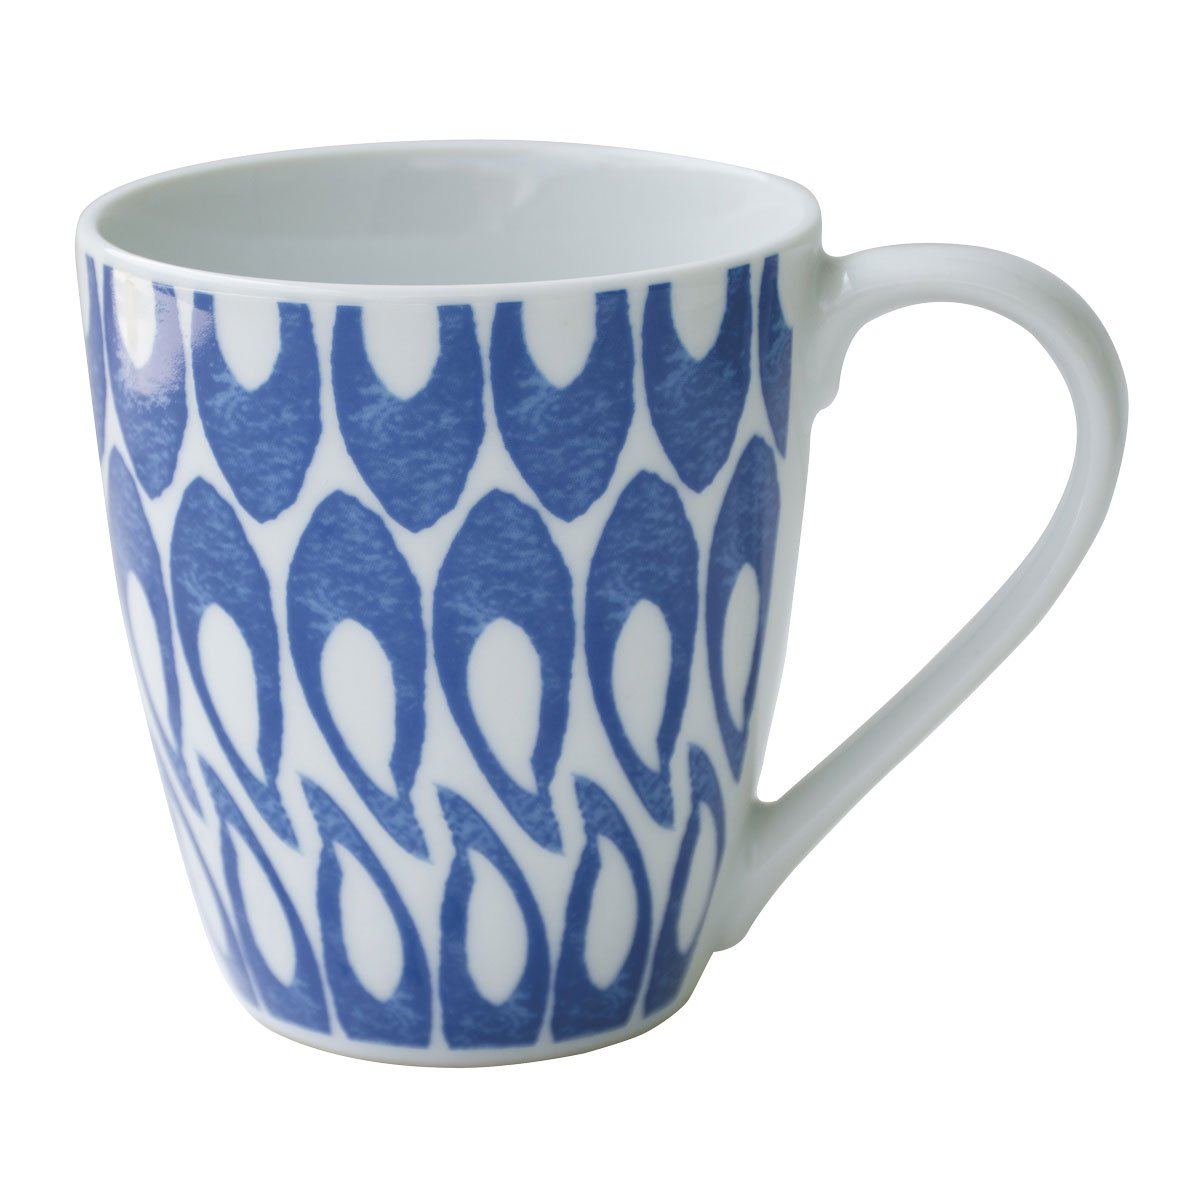 Vajilla de porcelana 16 piezas l l sears com mx me for Vajilla precio